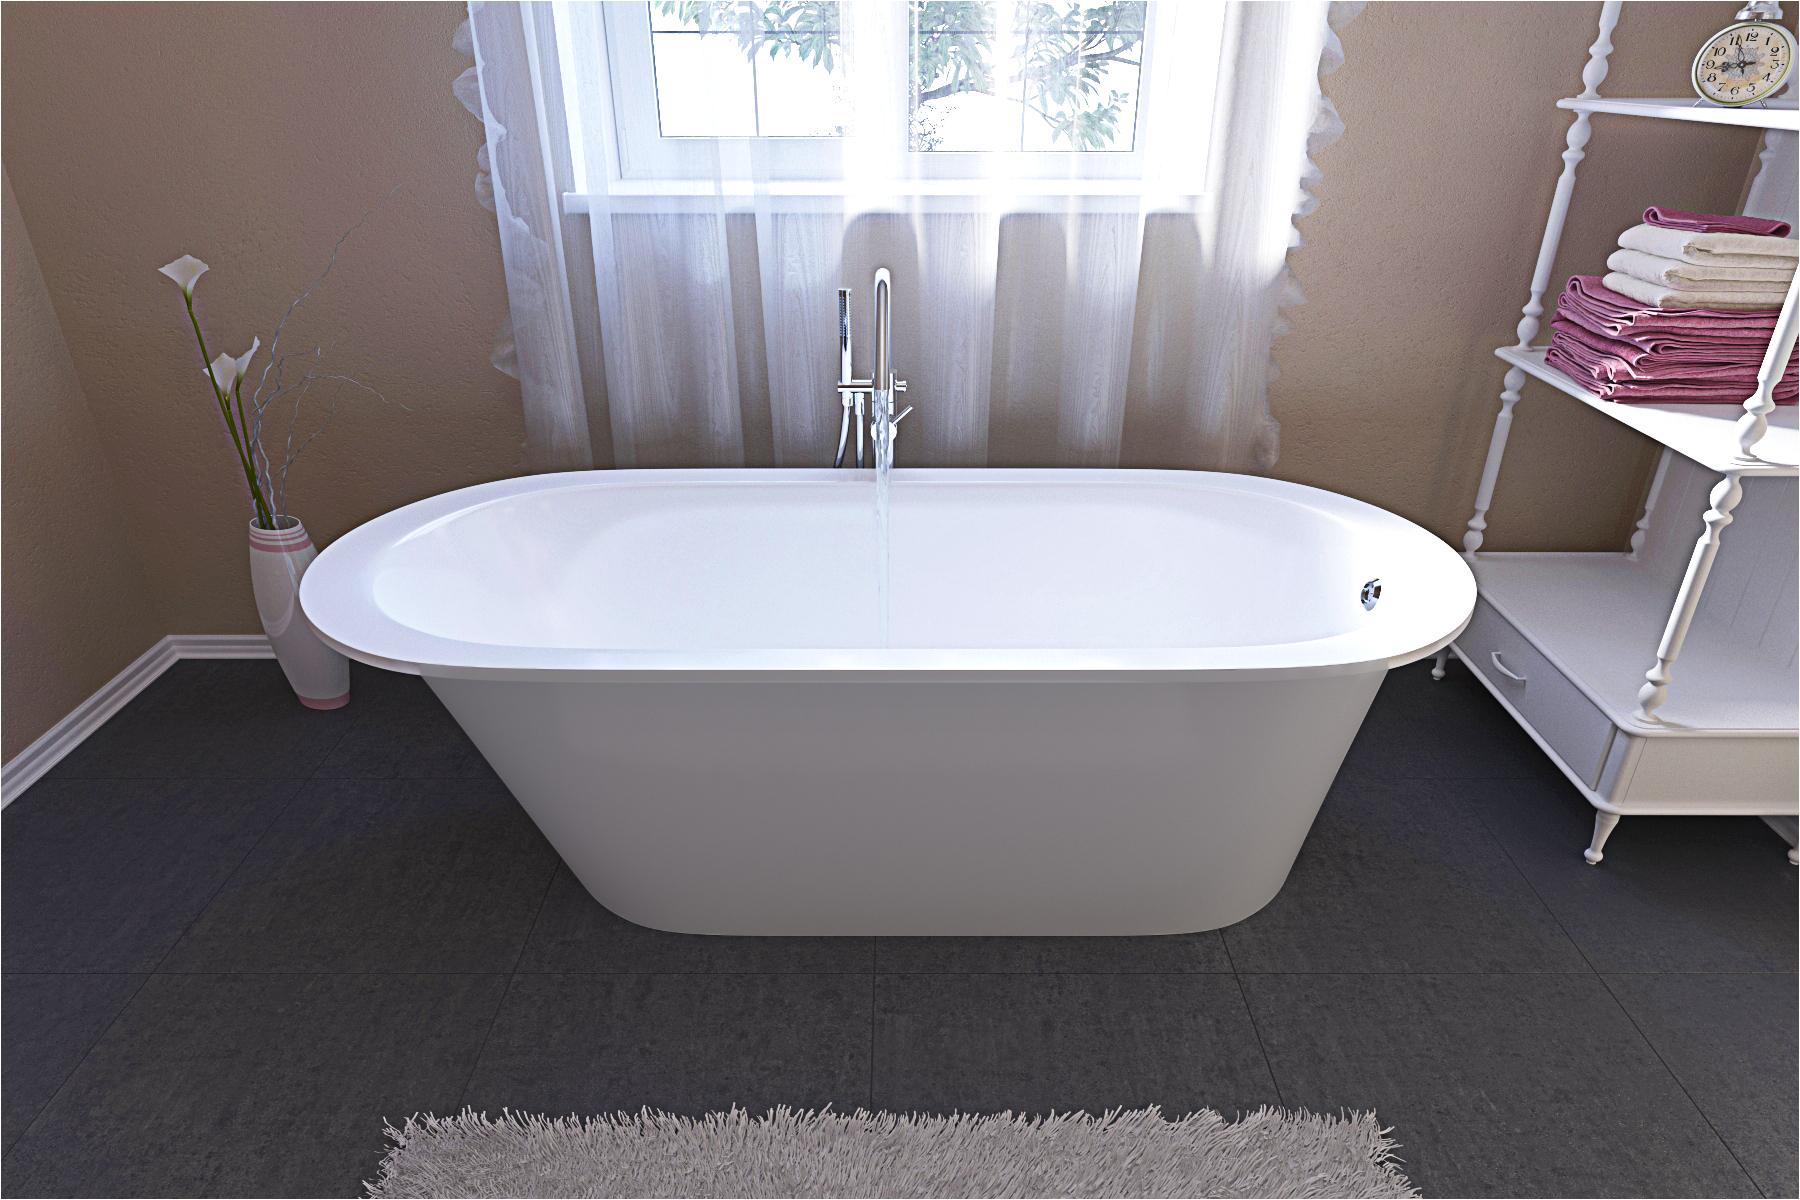 aquatica inflection a f wht freestanding stone bathtub main